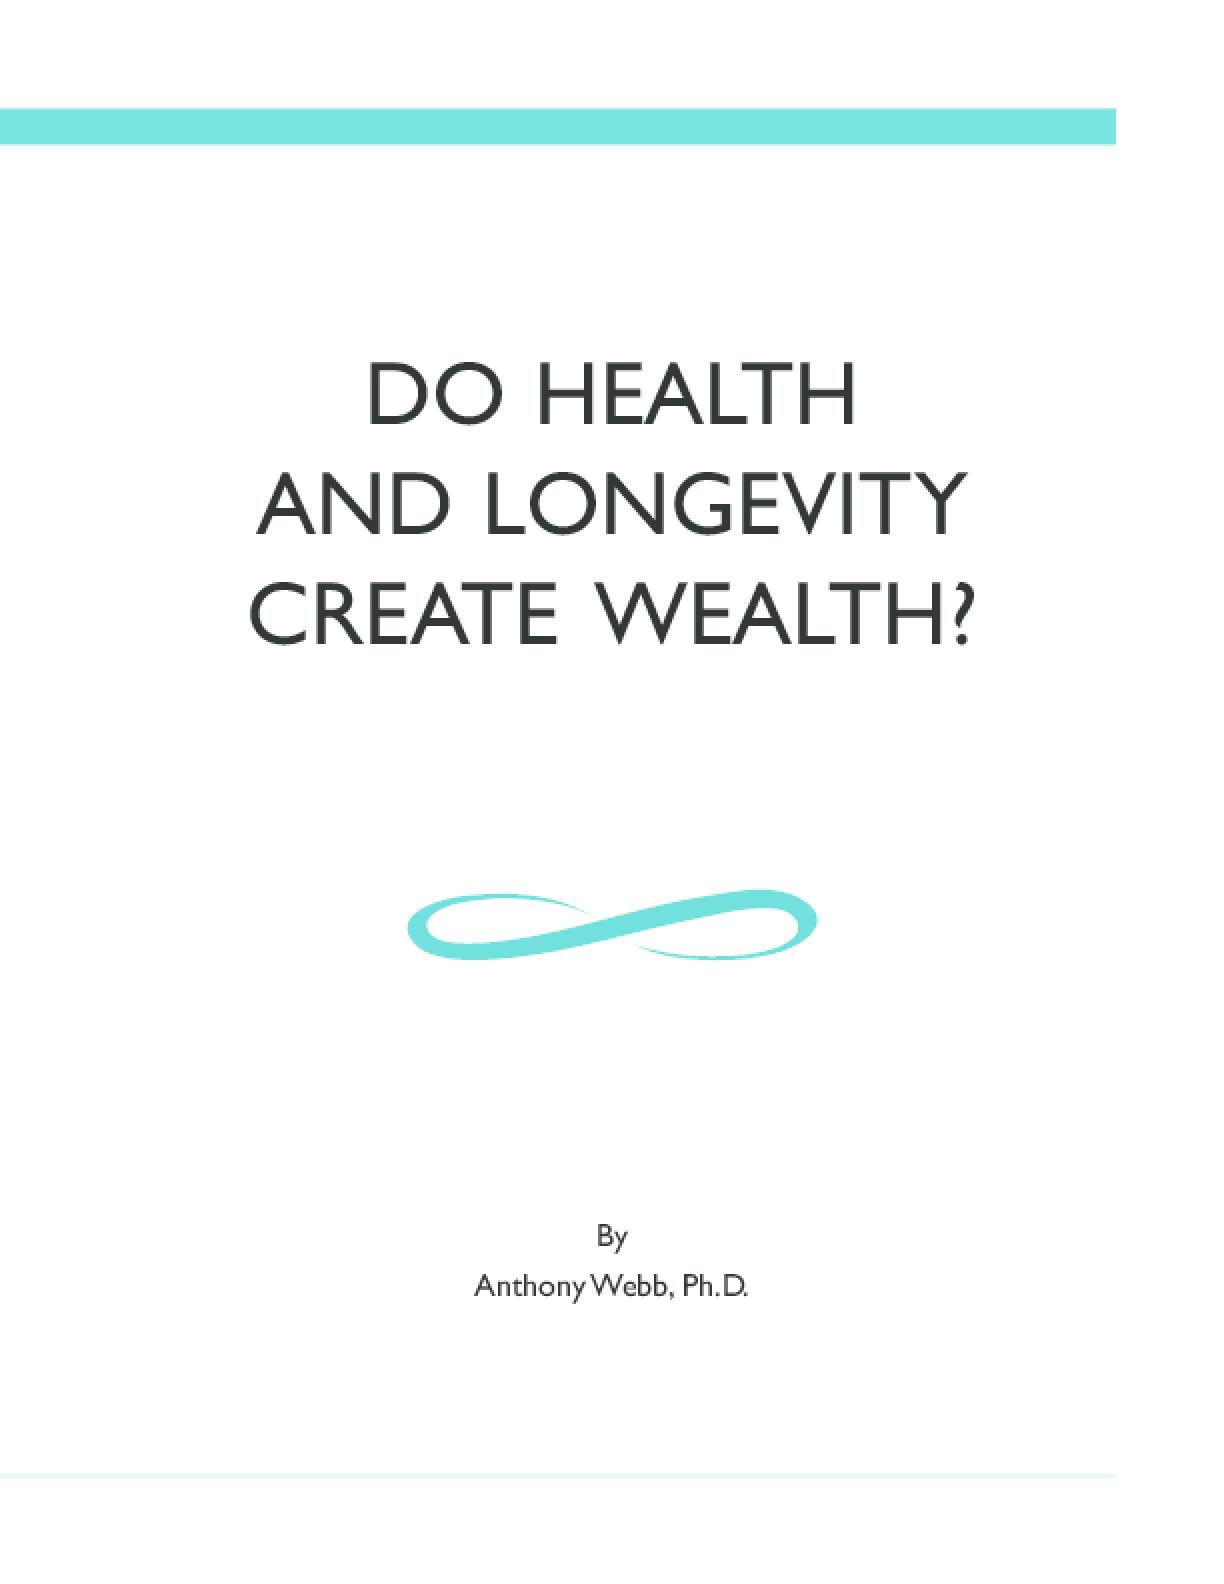 Do Health and Longevity Create Wealth?